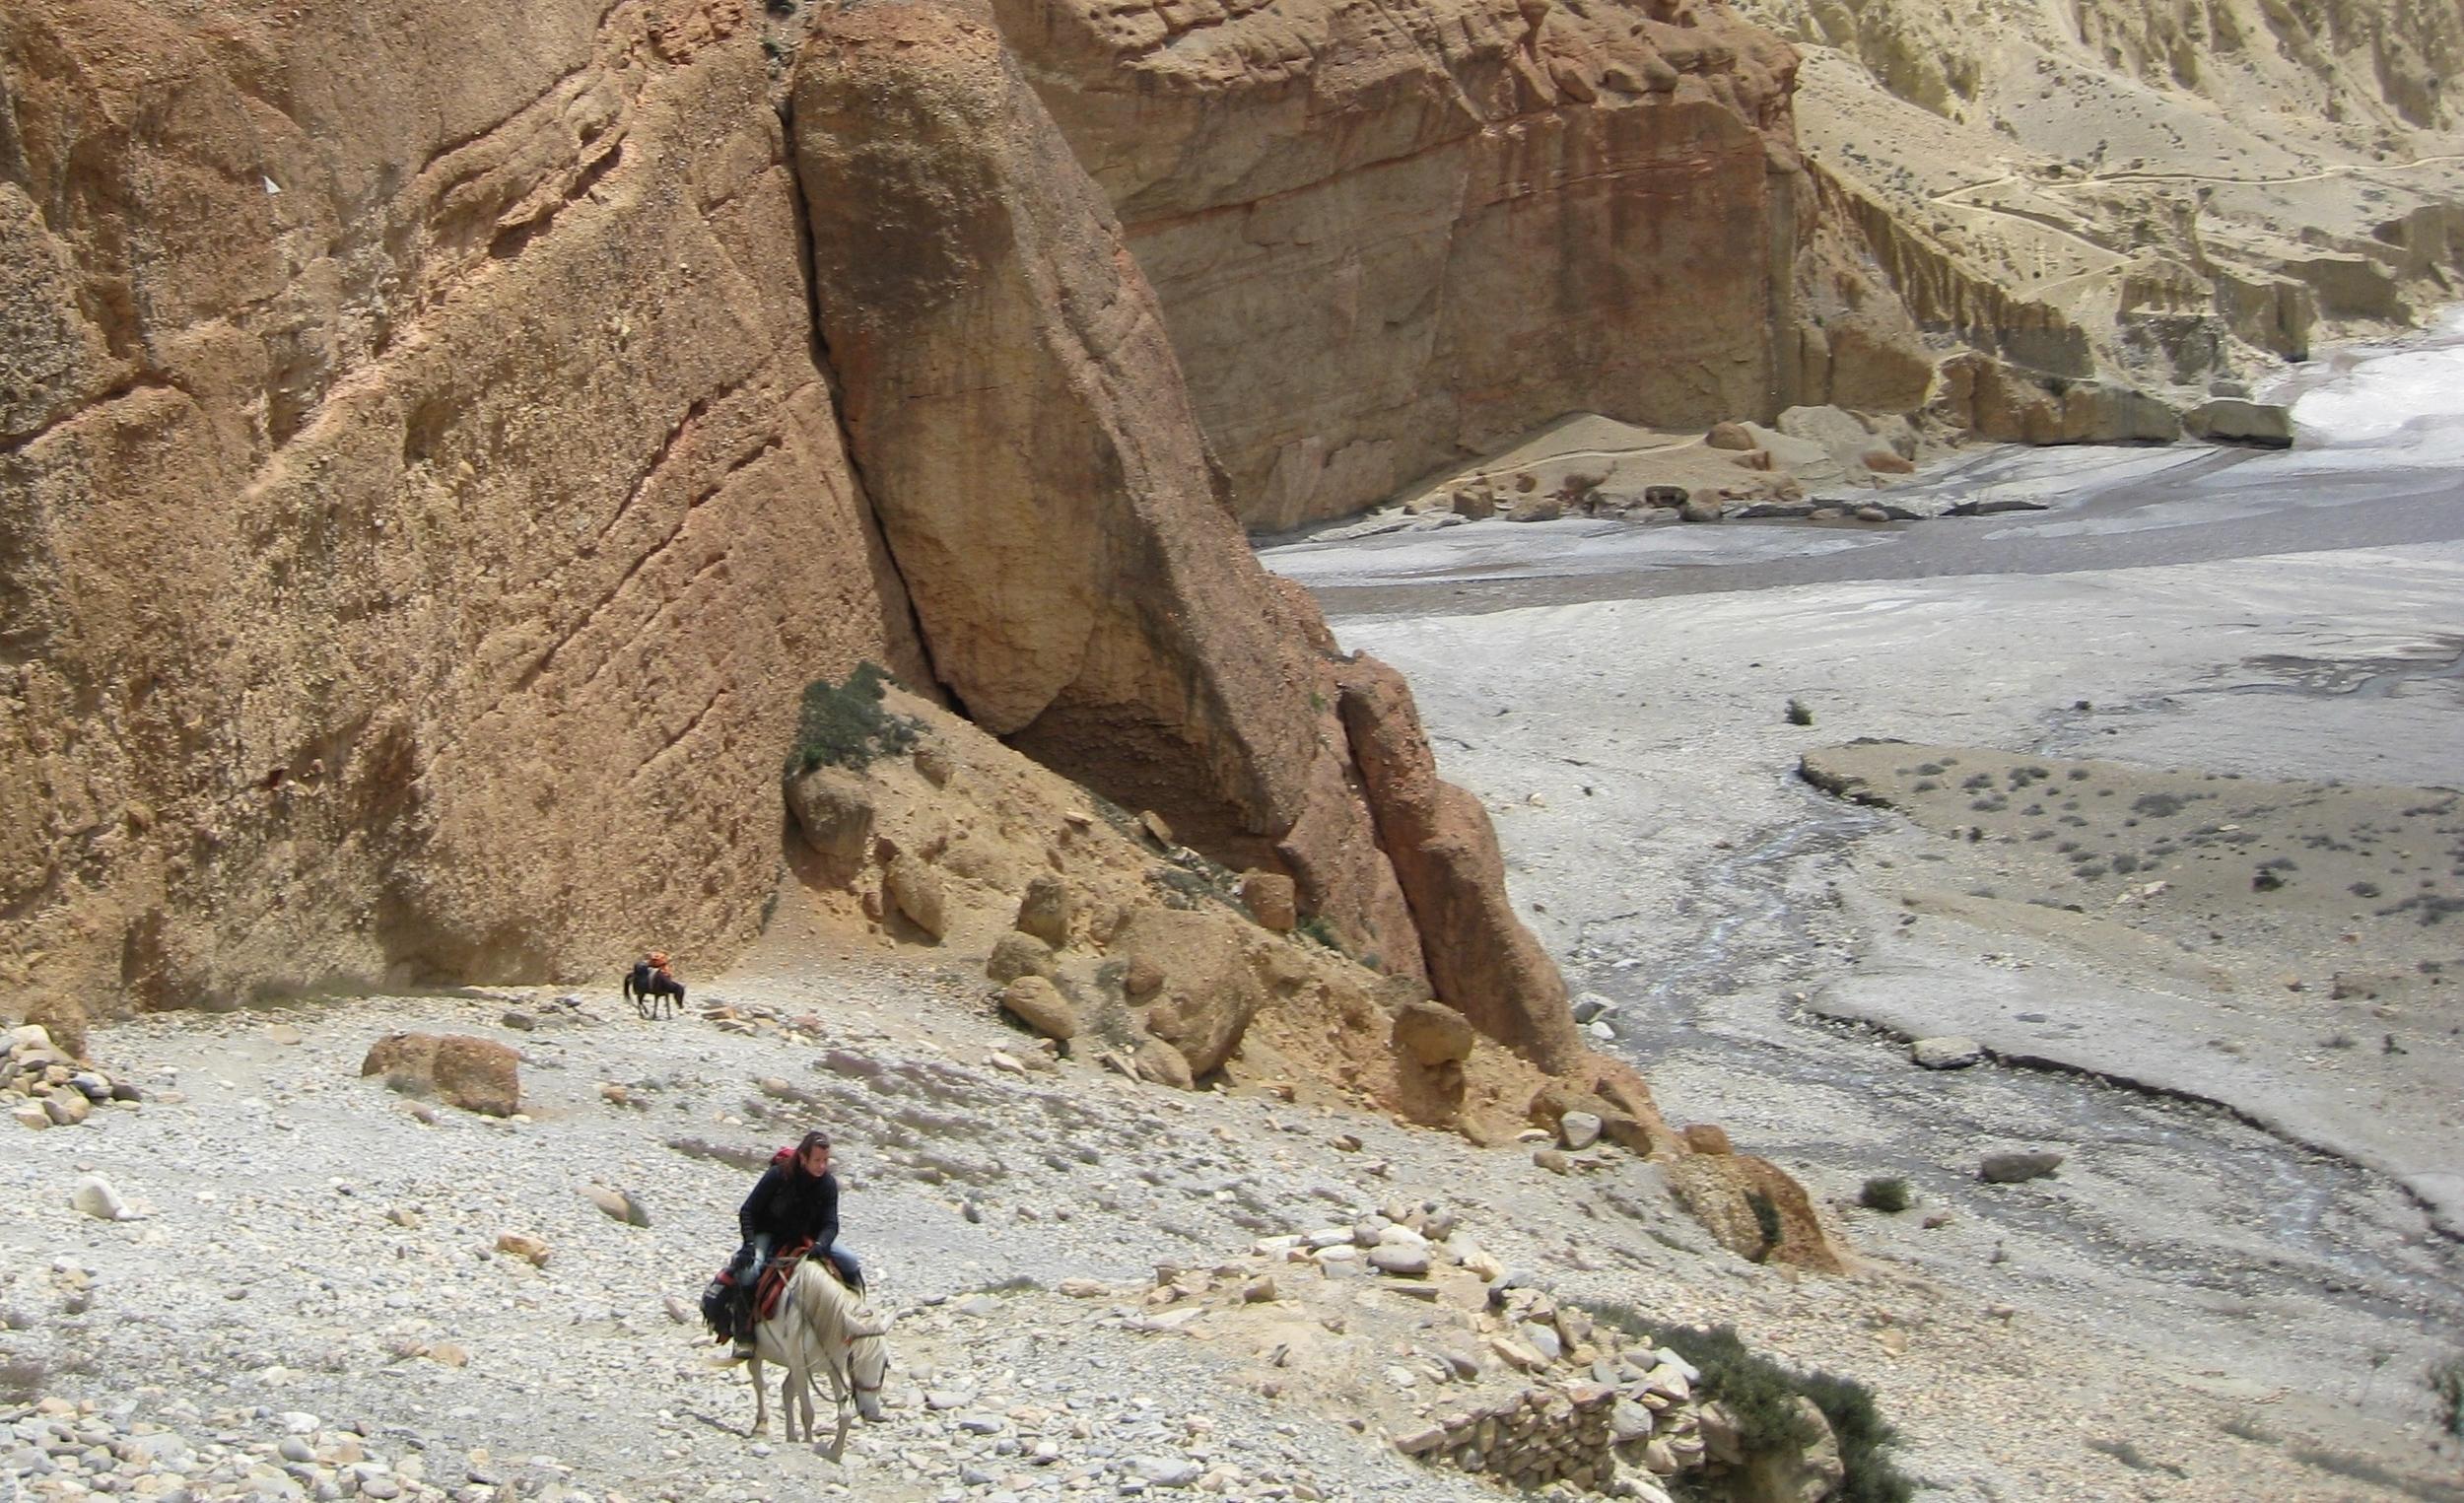 Drdak on Dolma ascending the path to Chele village near the Kali Gandaki's Mustang Gate, Upper Mustang 2008.